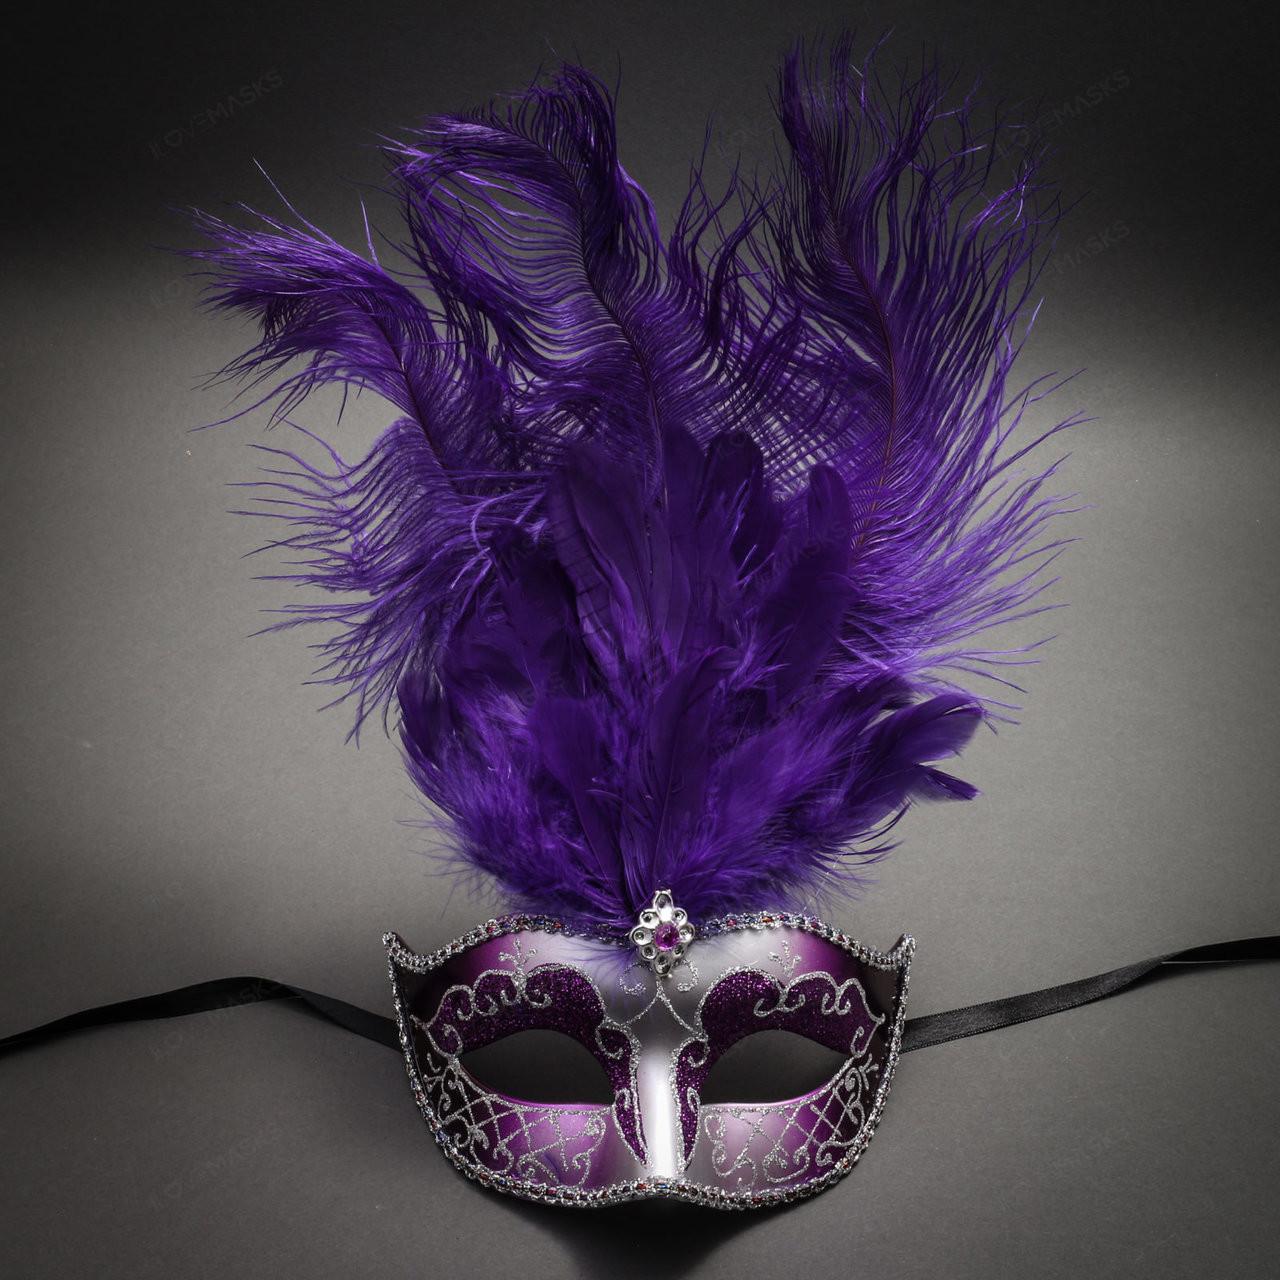 venetian mask silver mask,rhinestone mask prom mask masquerade ball mask costume mask masquerade mask mardi gras mask halloween mask